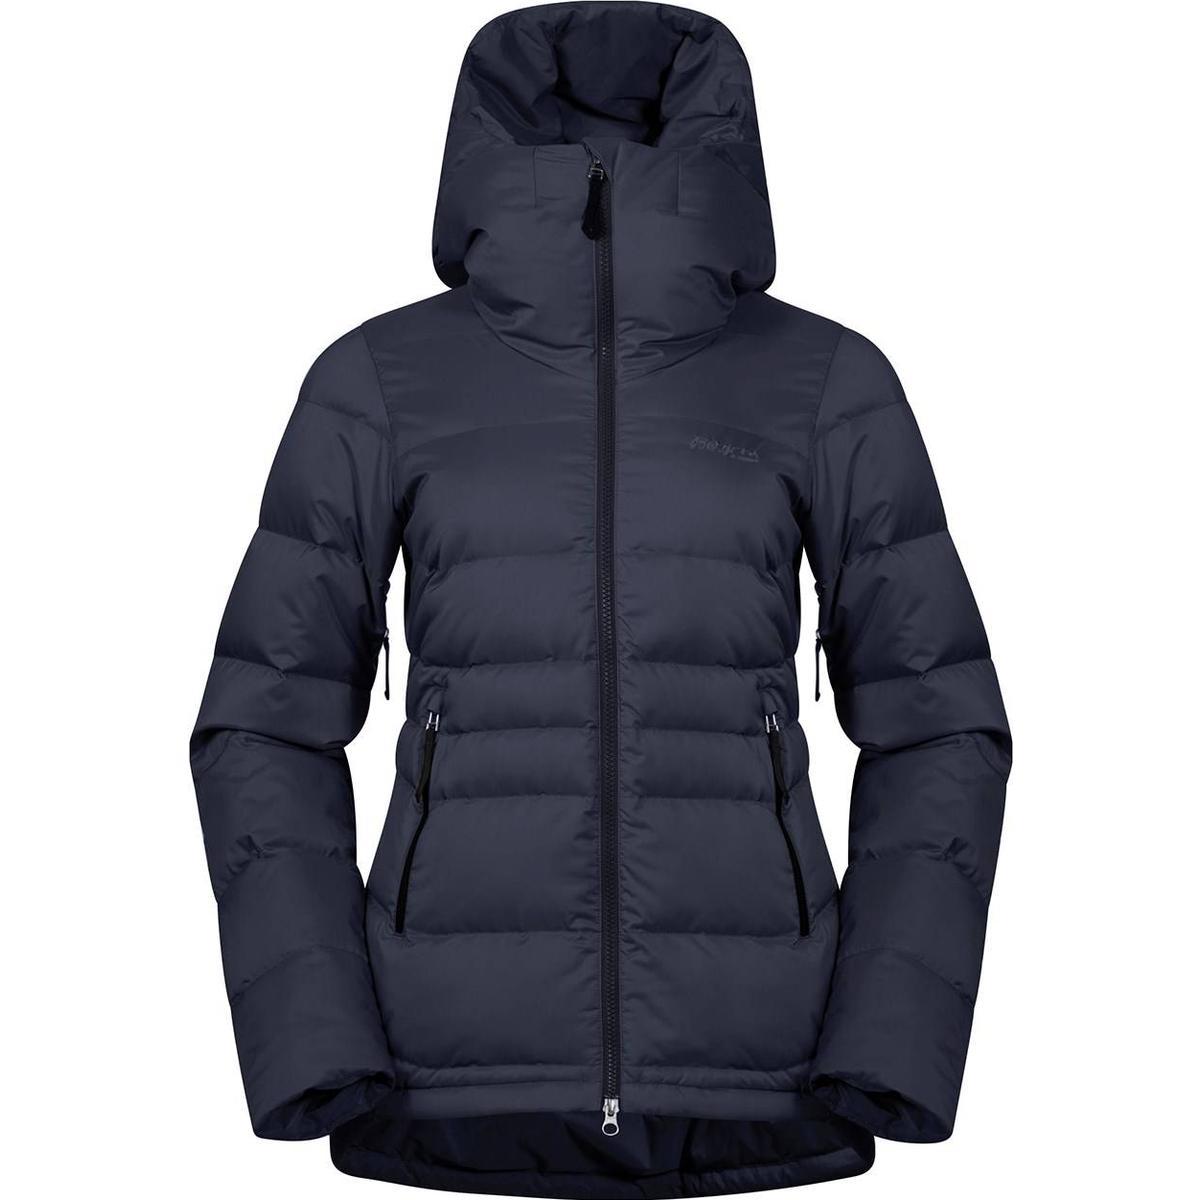 Bergans Ytterkläder (400+ produkter) hos PriceRunner • Se